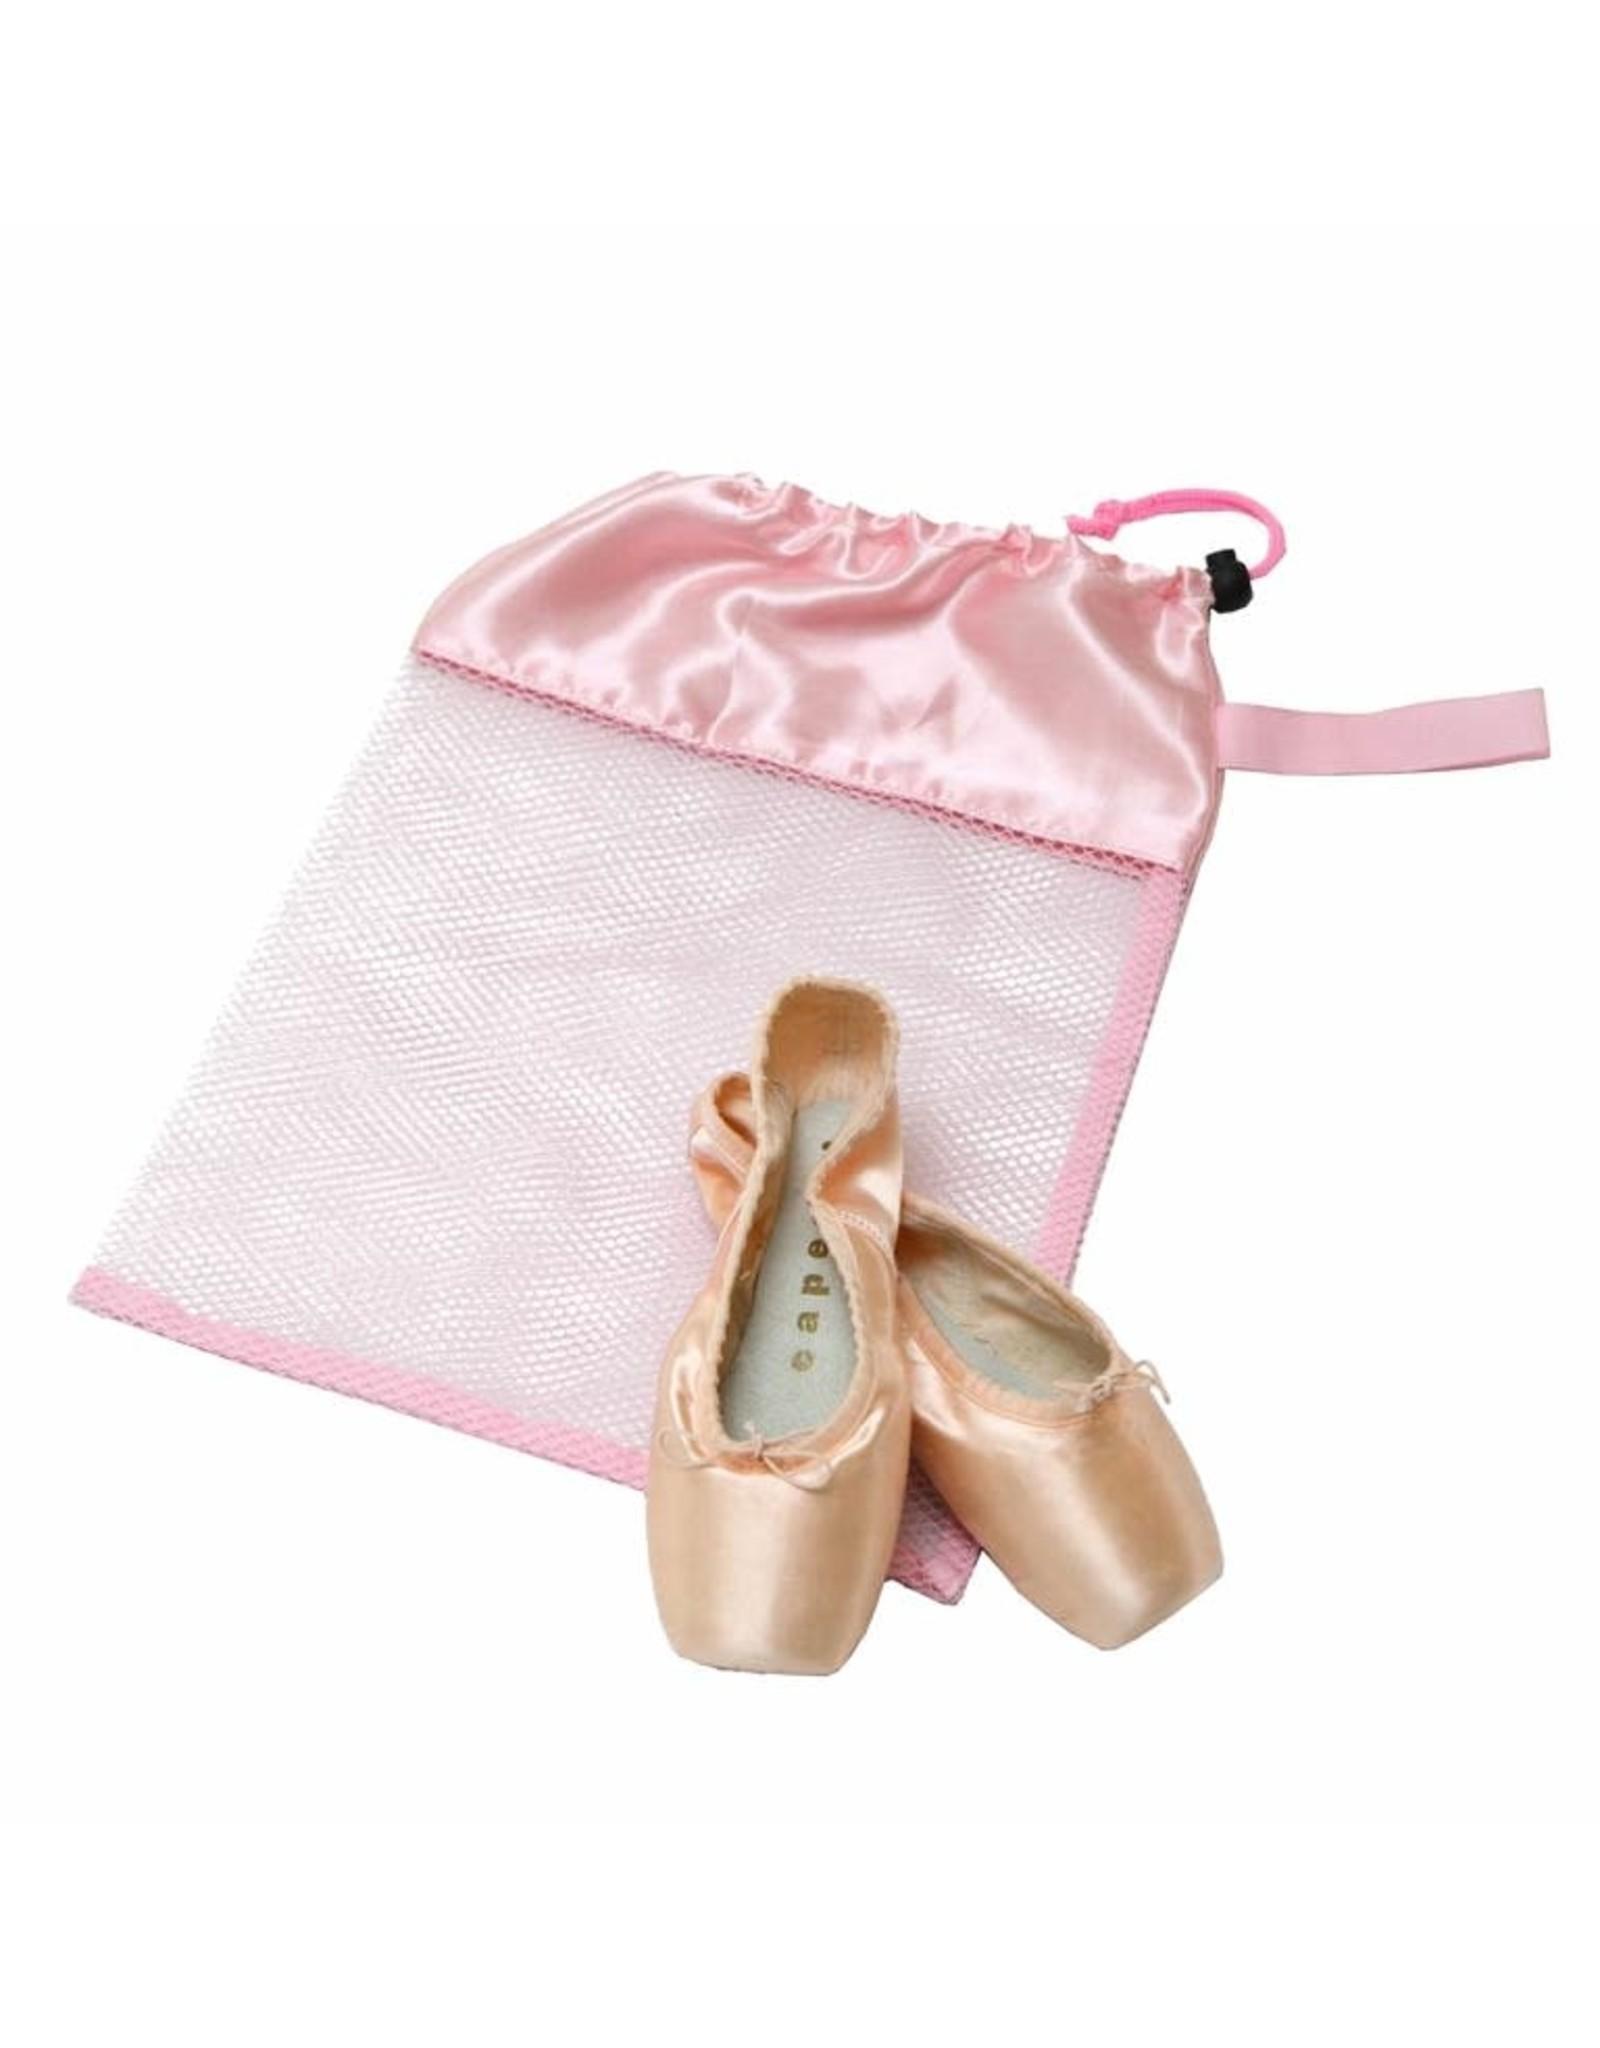 Horizon Dance Mesh Shoe Bag